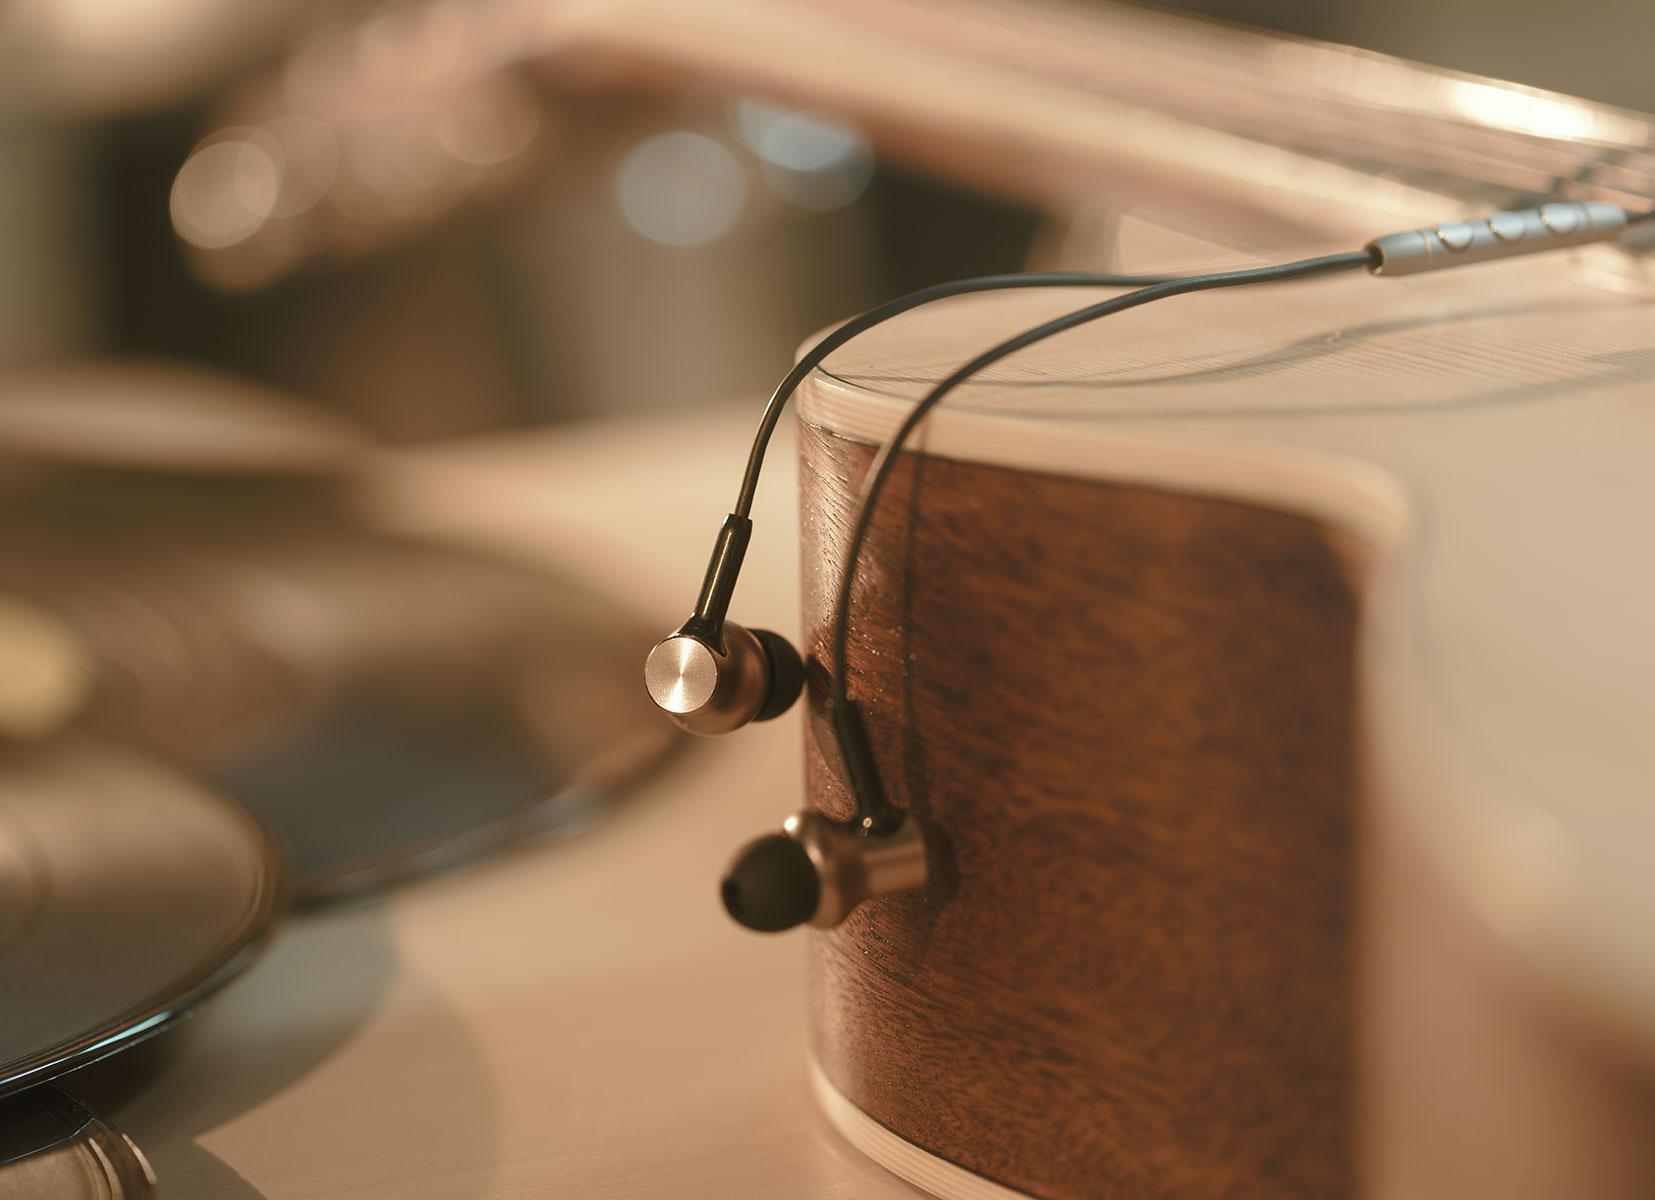 MI In-ear headphones